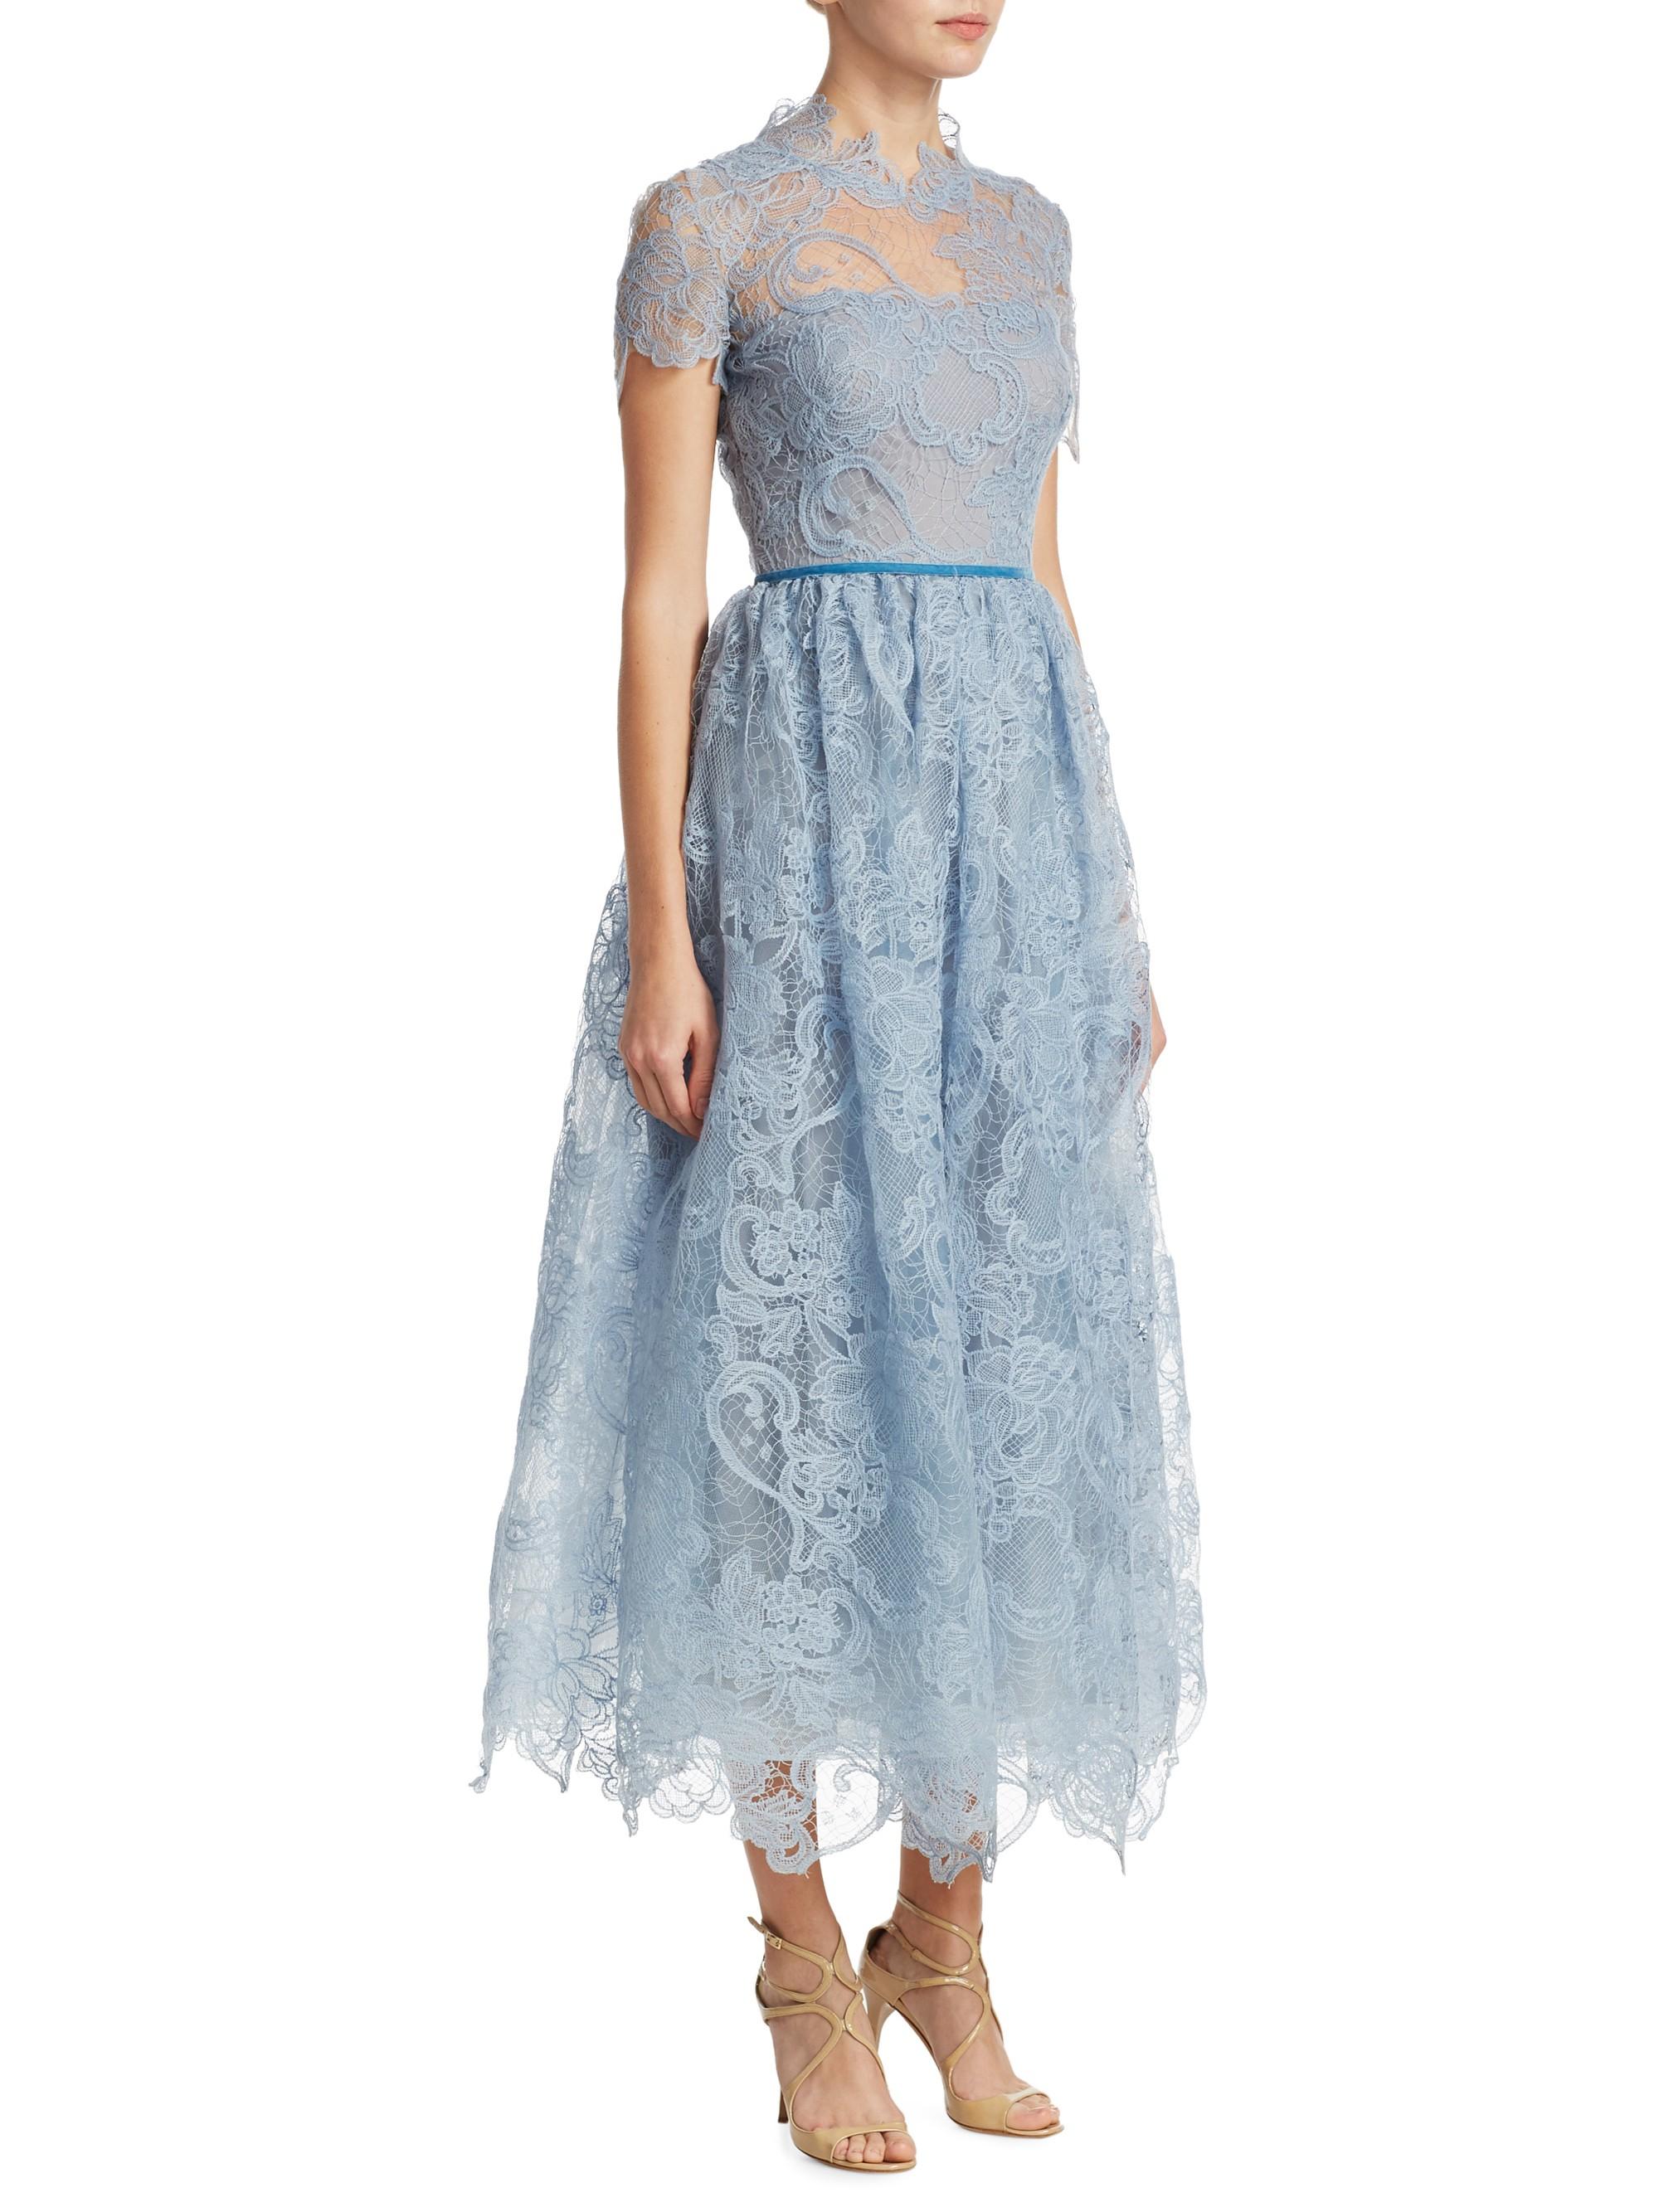 eb58bac20 Marchesa Notte Scalloped Lace Gown - Powder Blue 6